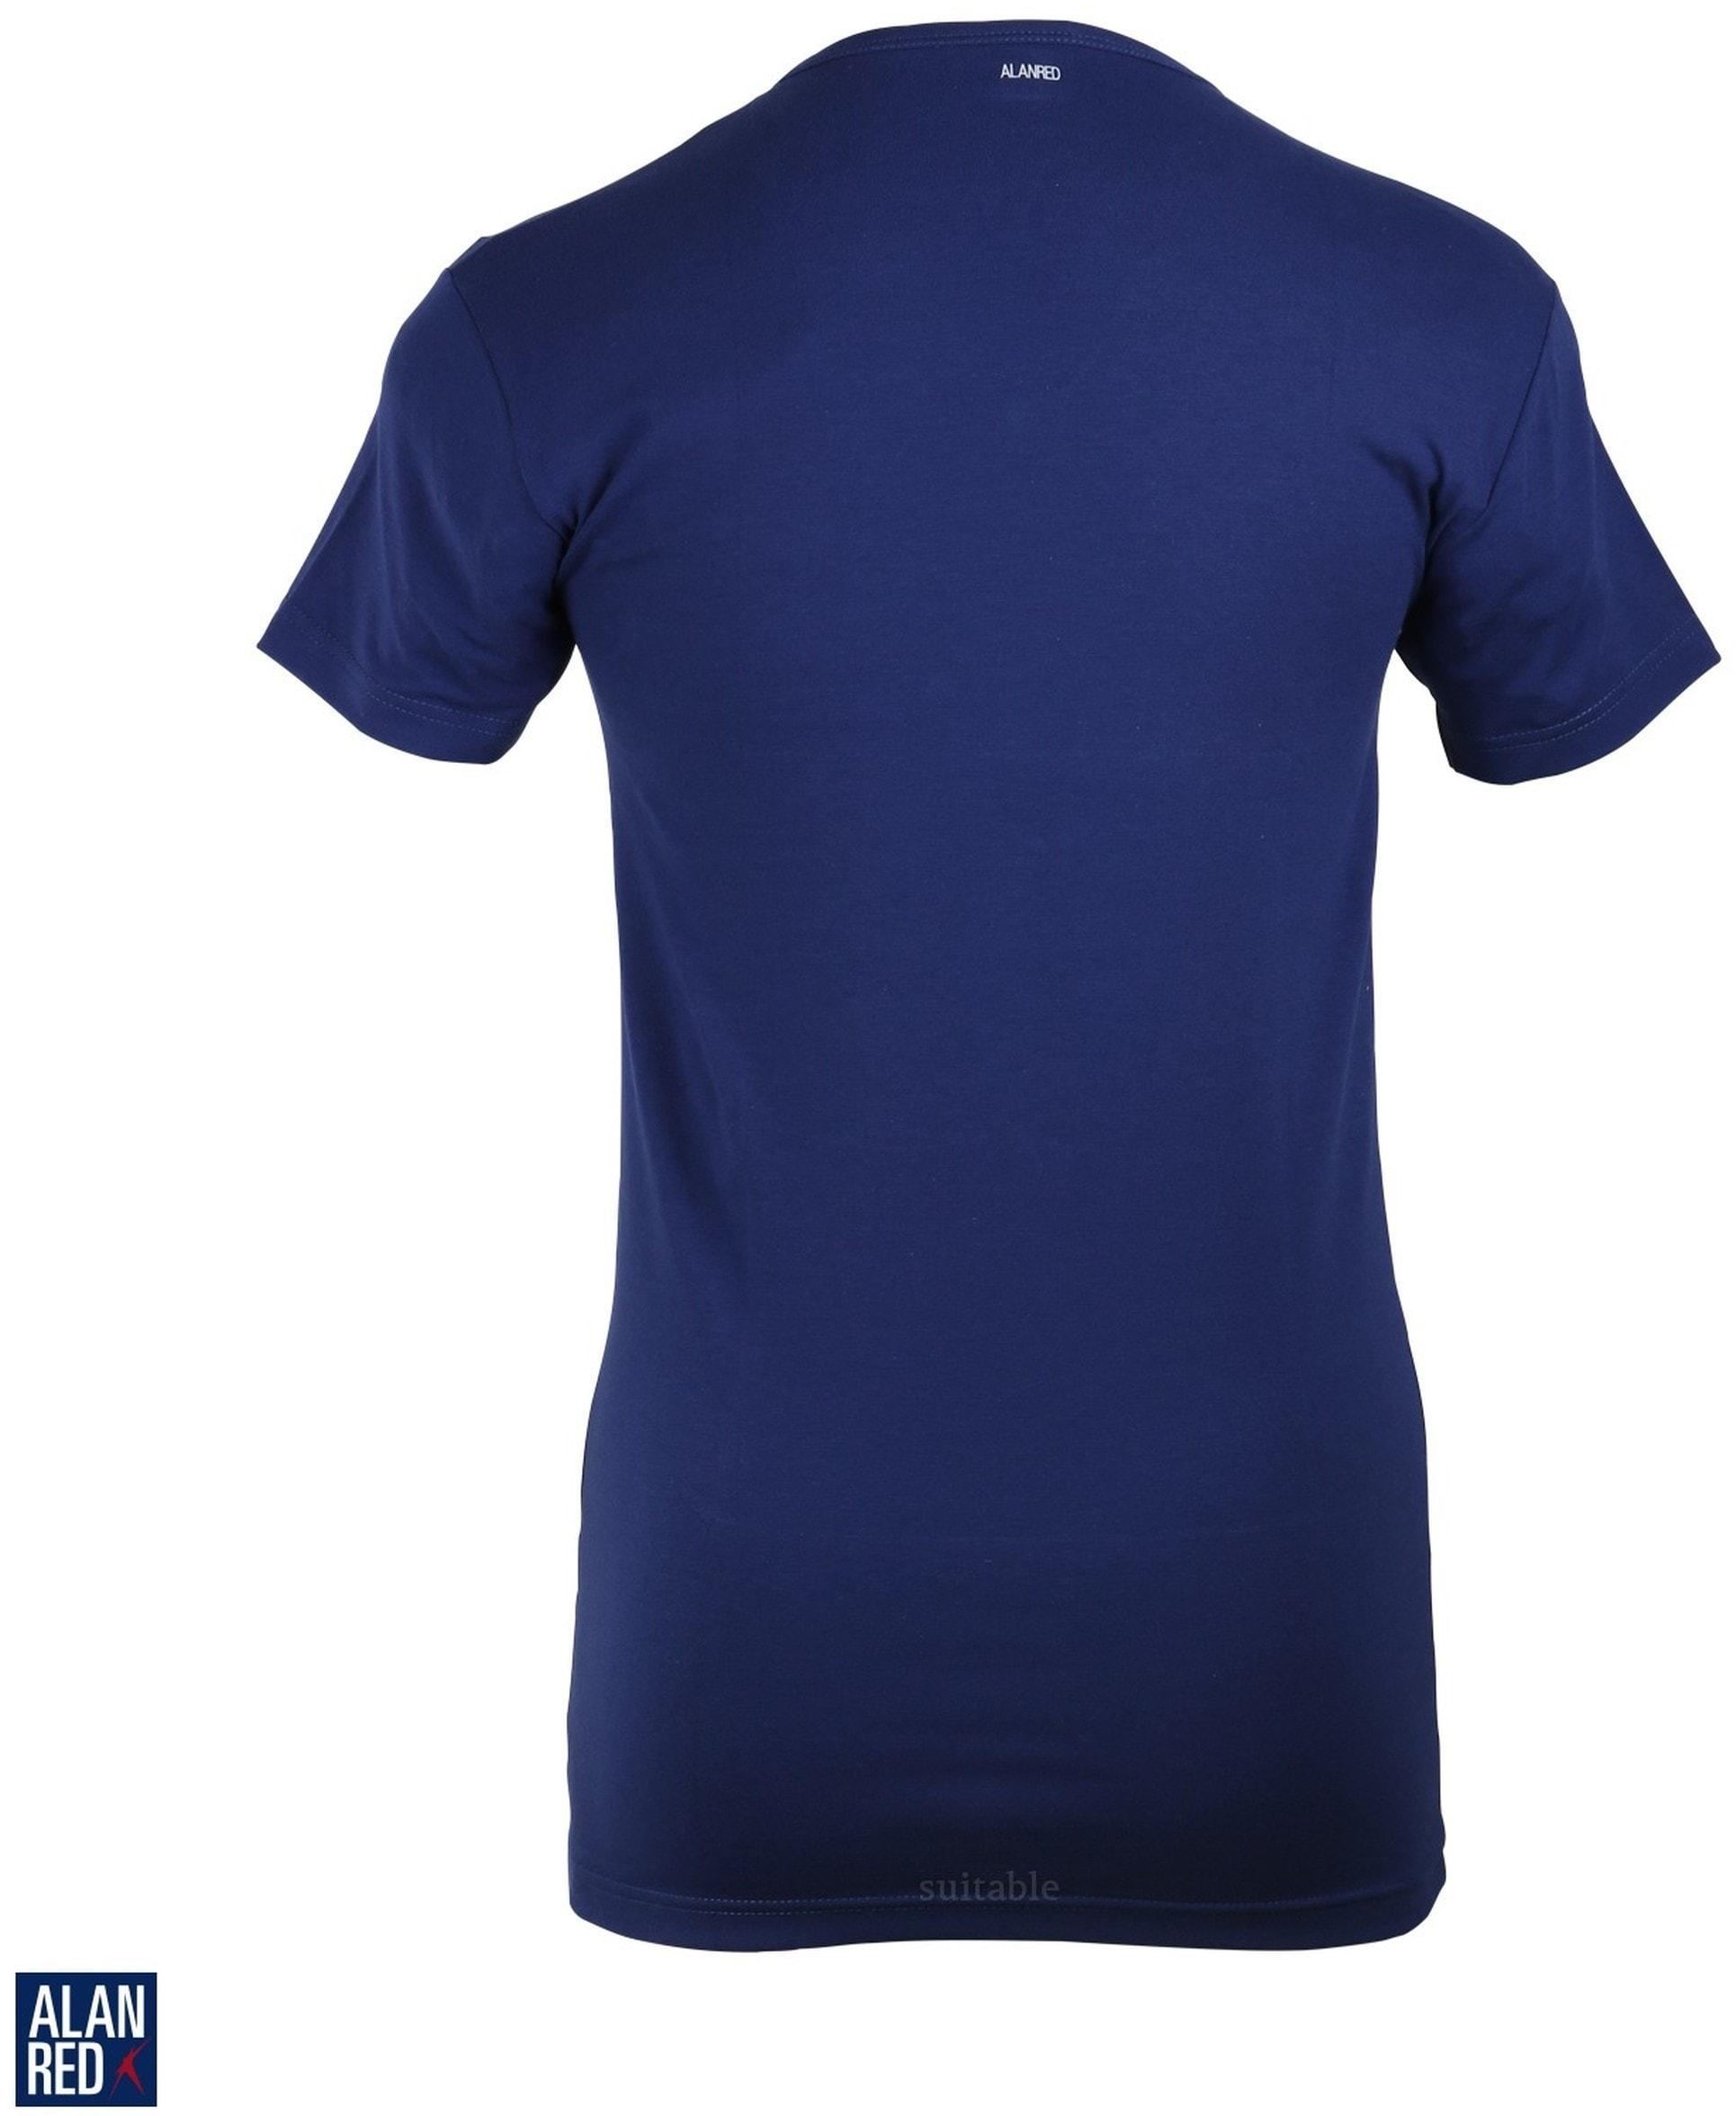 Alan Red Oklahoma T-shirt Stretch Ultramarine 1-Pack foto 2